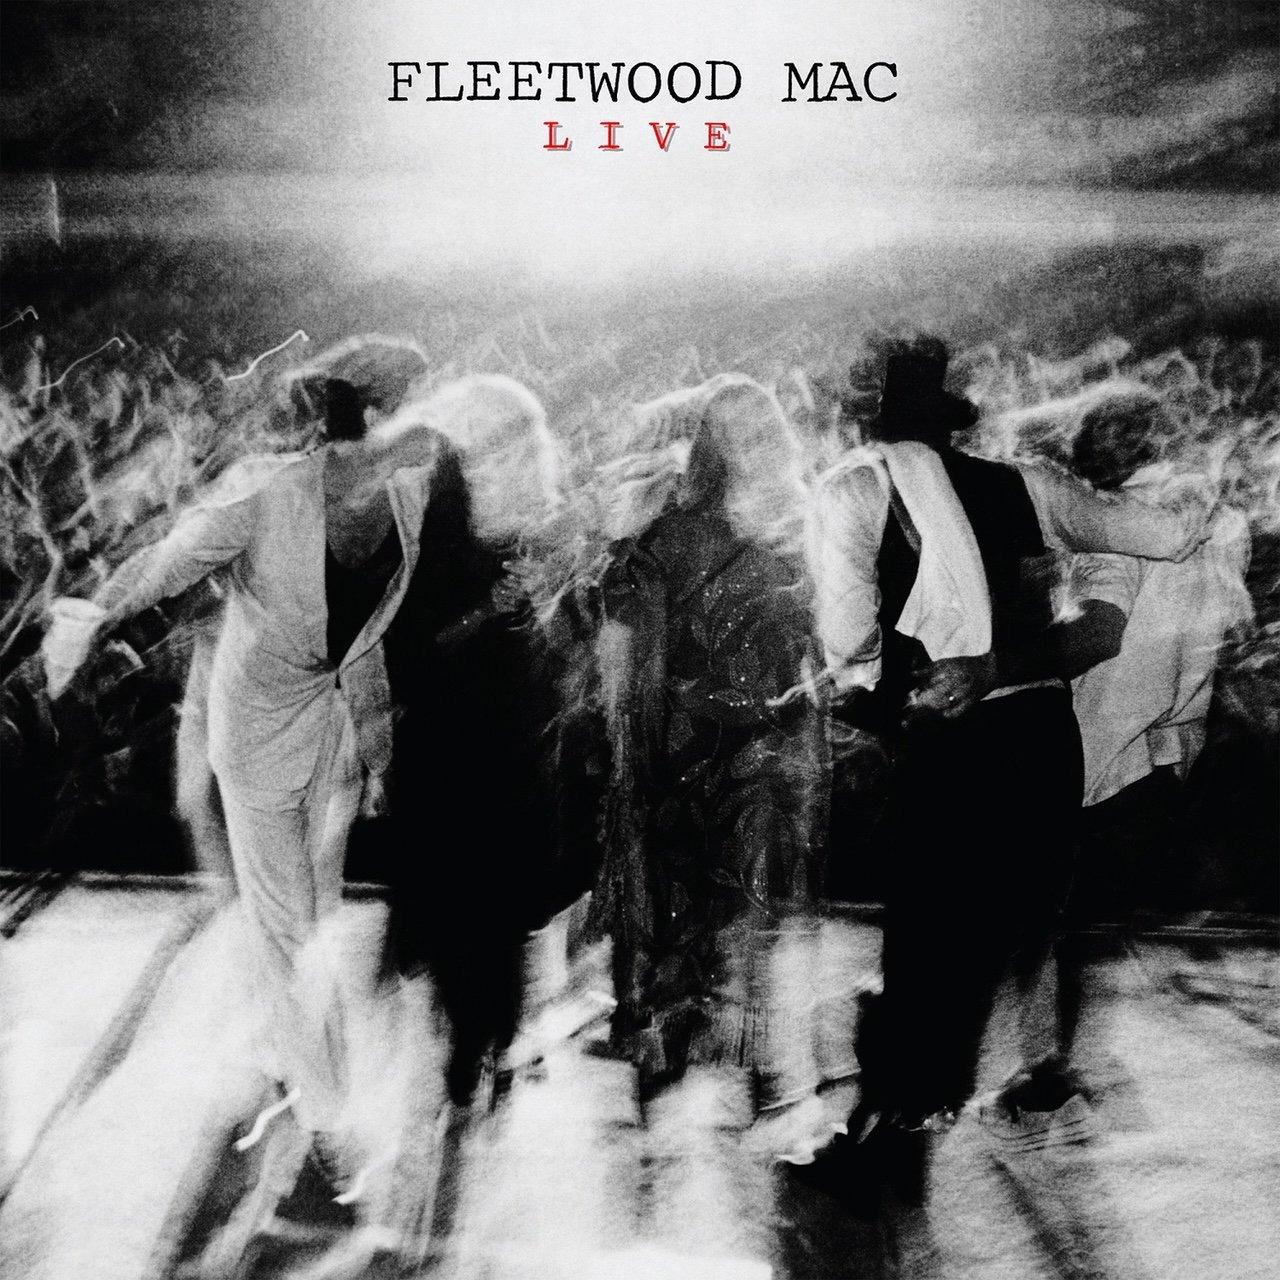 Live - Fleetwood Mac - Musik - RHINO - 0603497846276 - June 25, 2021